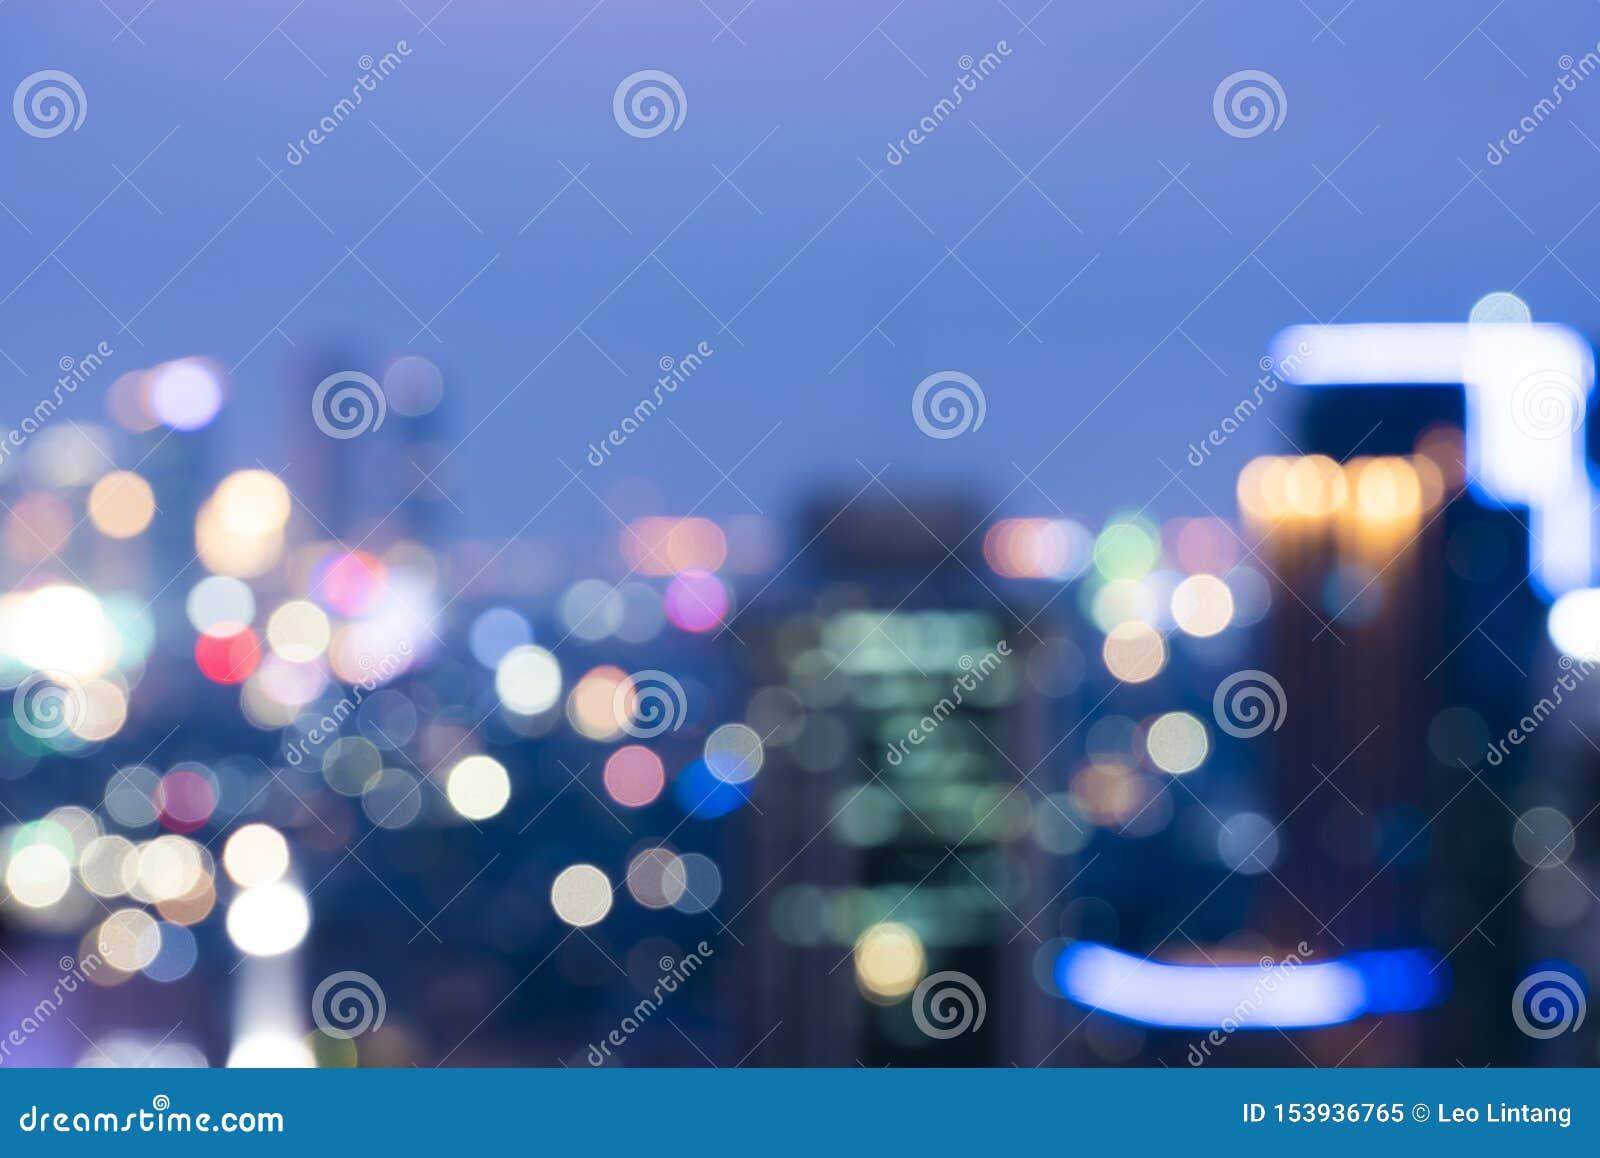 Jakarta City Skyline With Blurred Lights At Night Stock ...